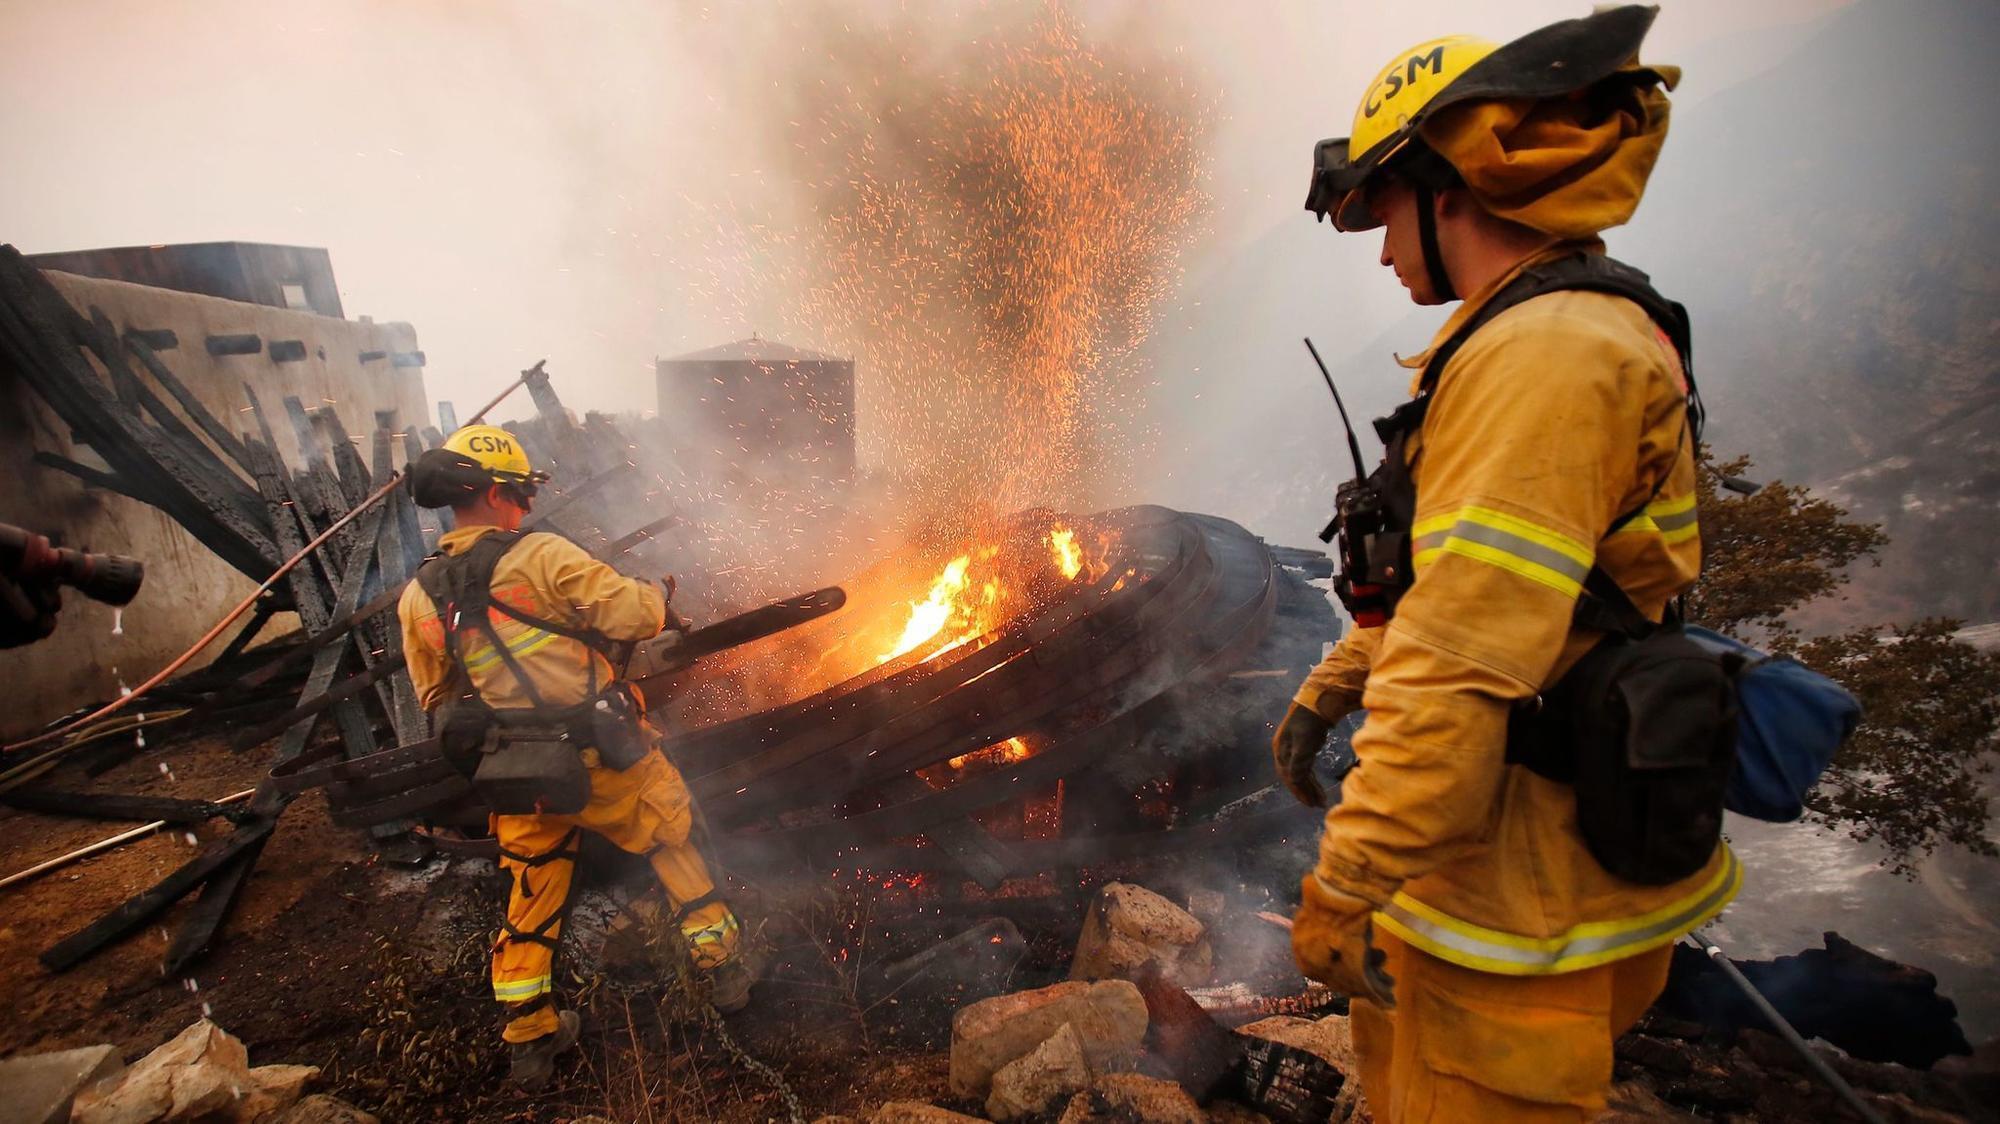 Firefighter killed battling Thomas fire as massive blaze moves toward Santa Barbara